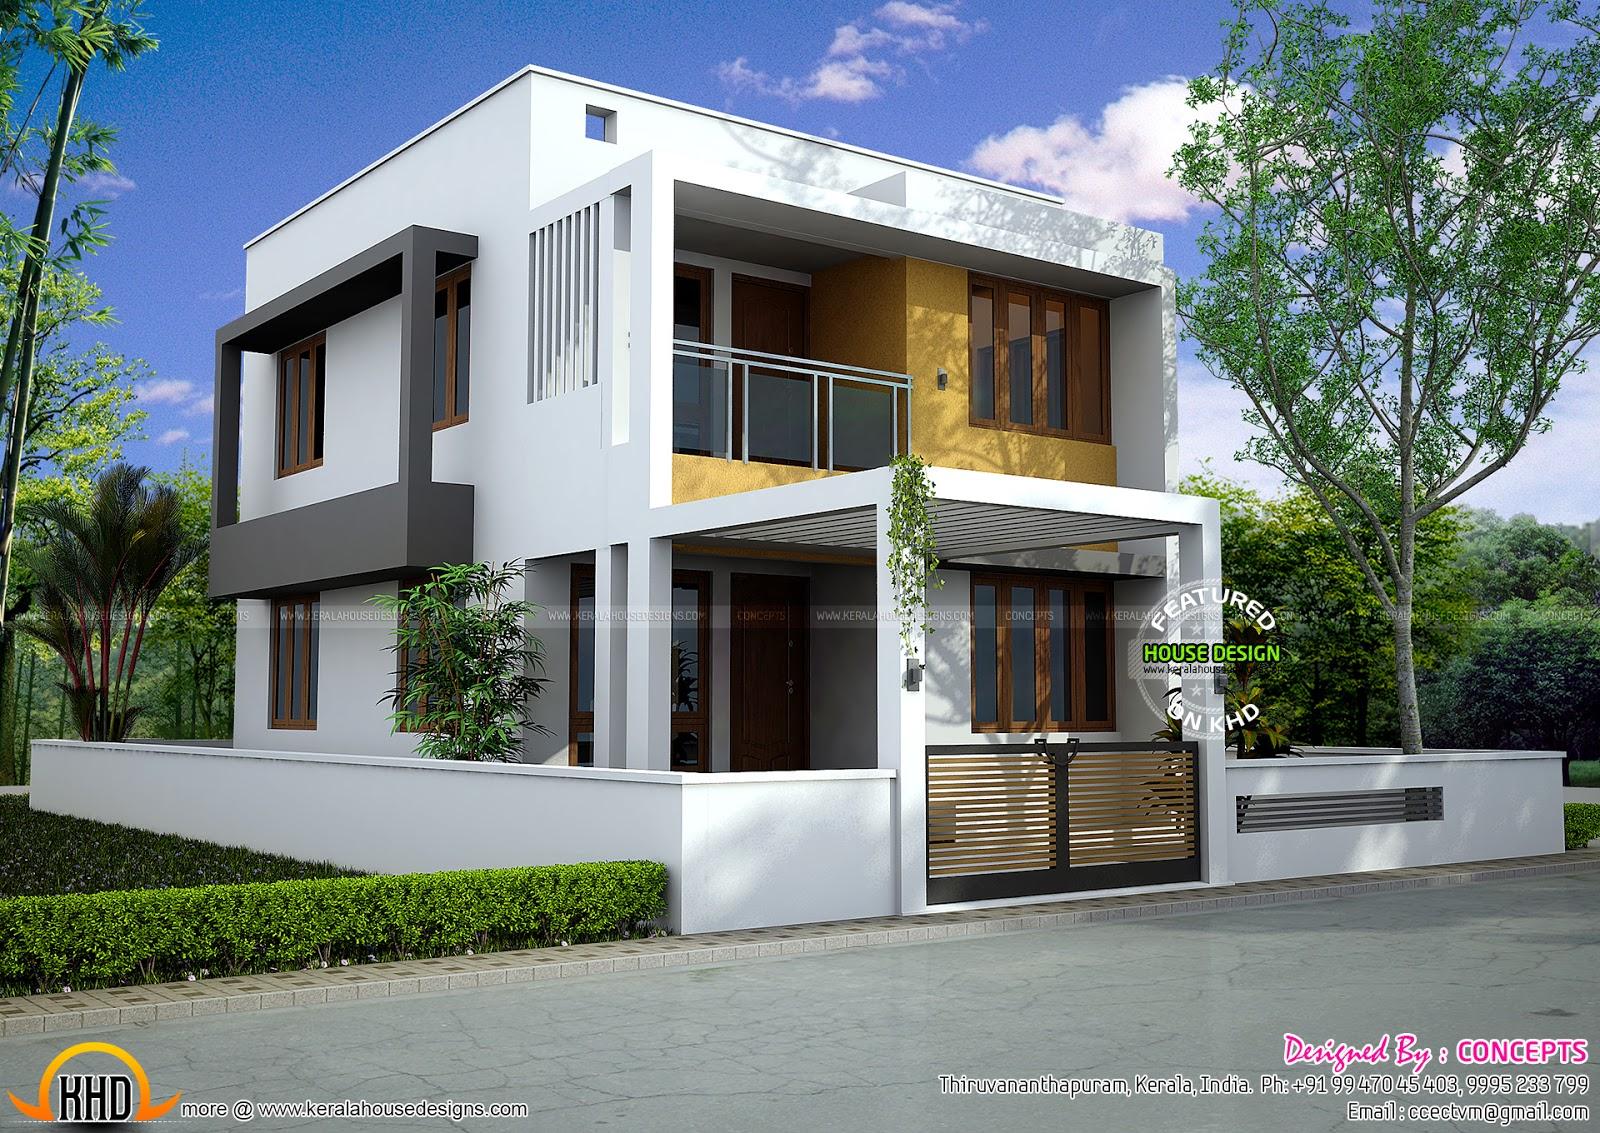 3 Bedroom 1 Story Modern House Plans Novocom Top